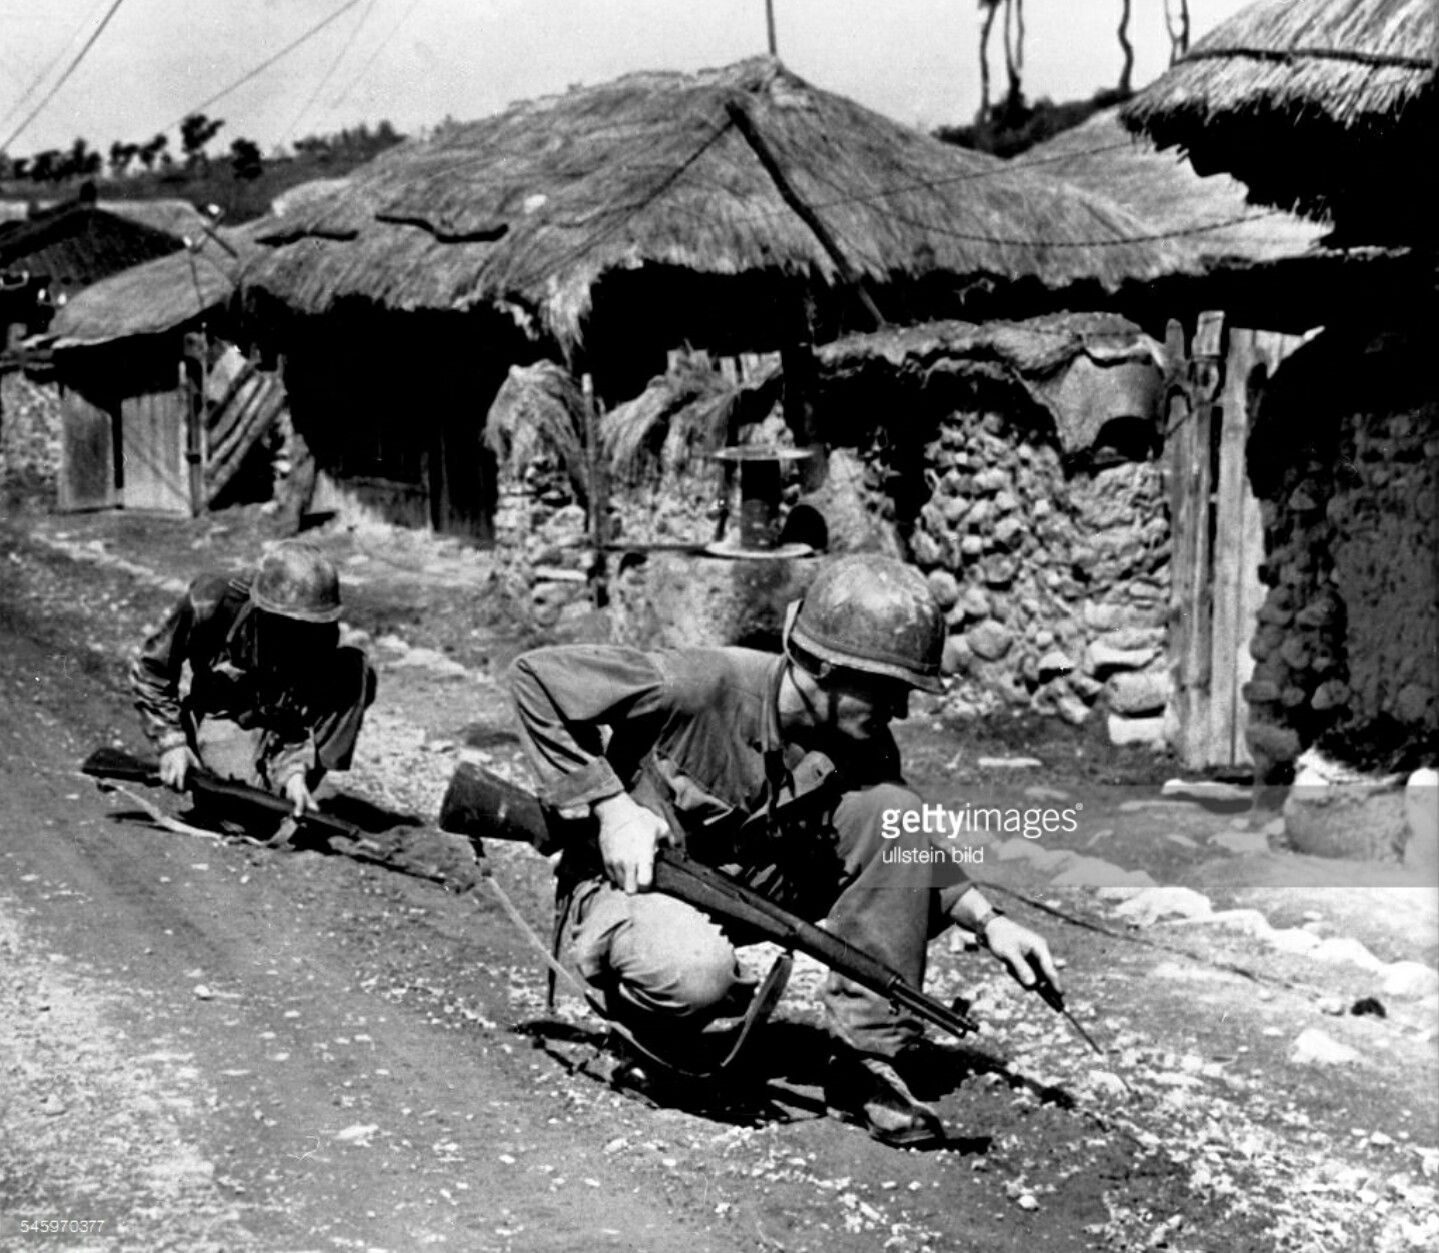 Pin By Daniel Sullivan On Korean War Korean War War Image Wwi